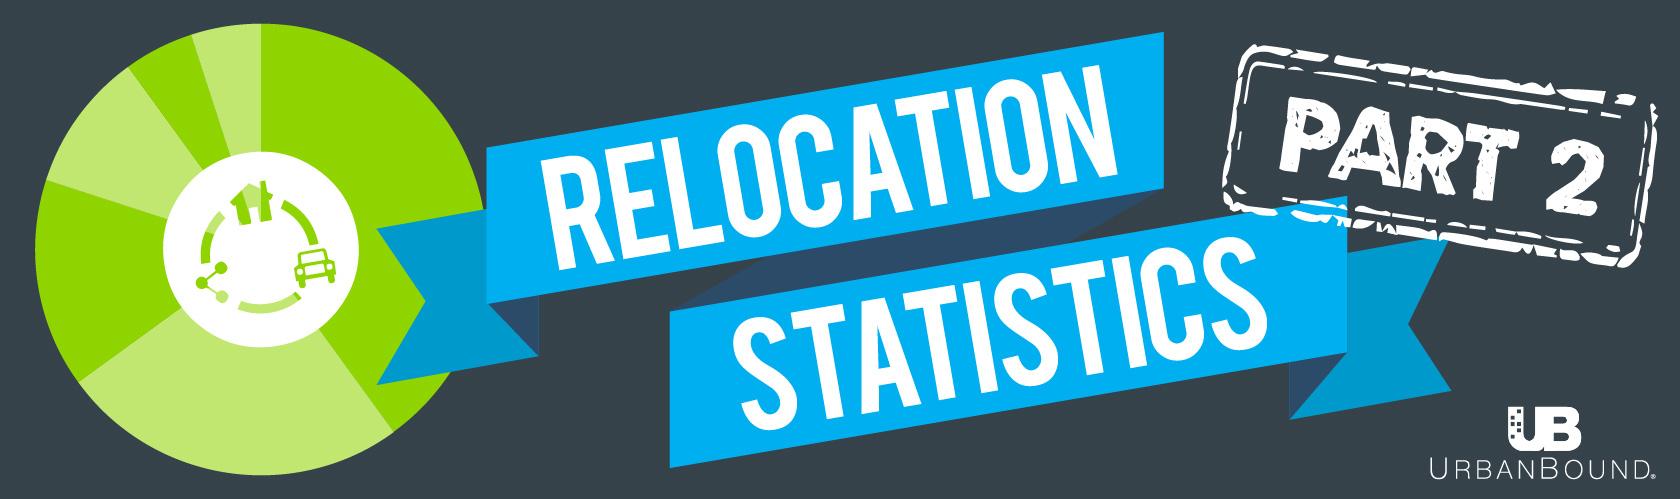 Relocation-Statistics Part 2